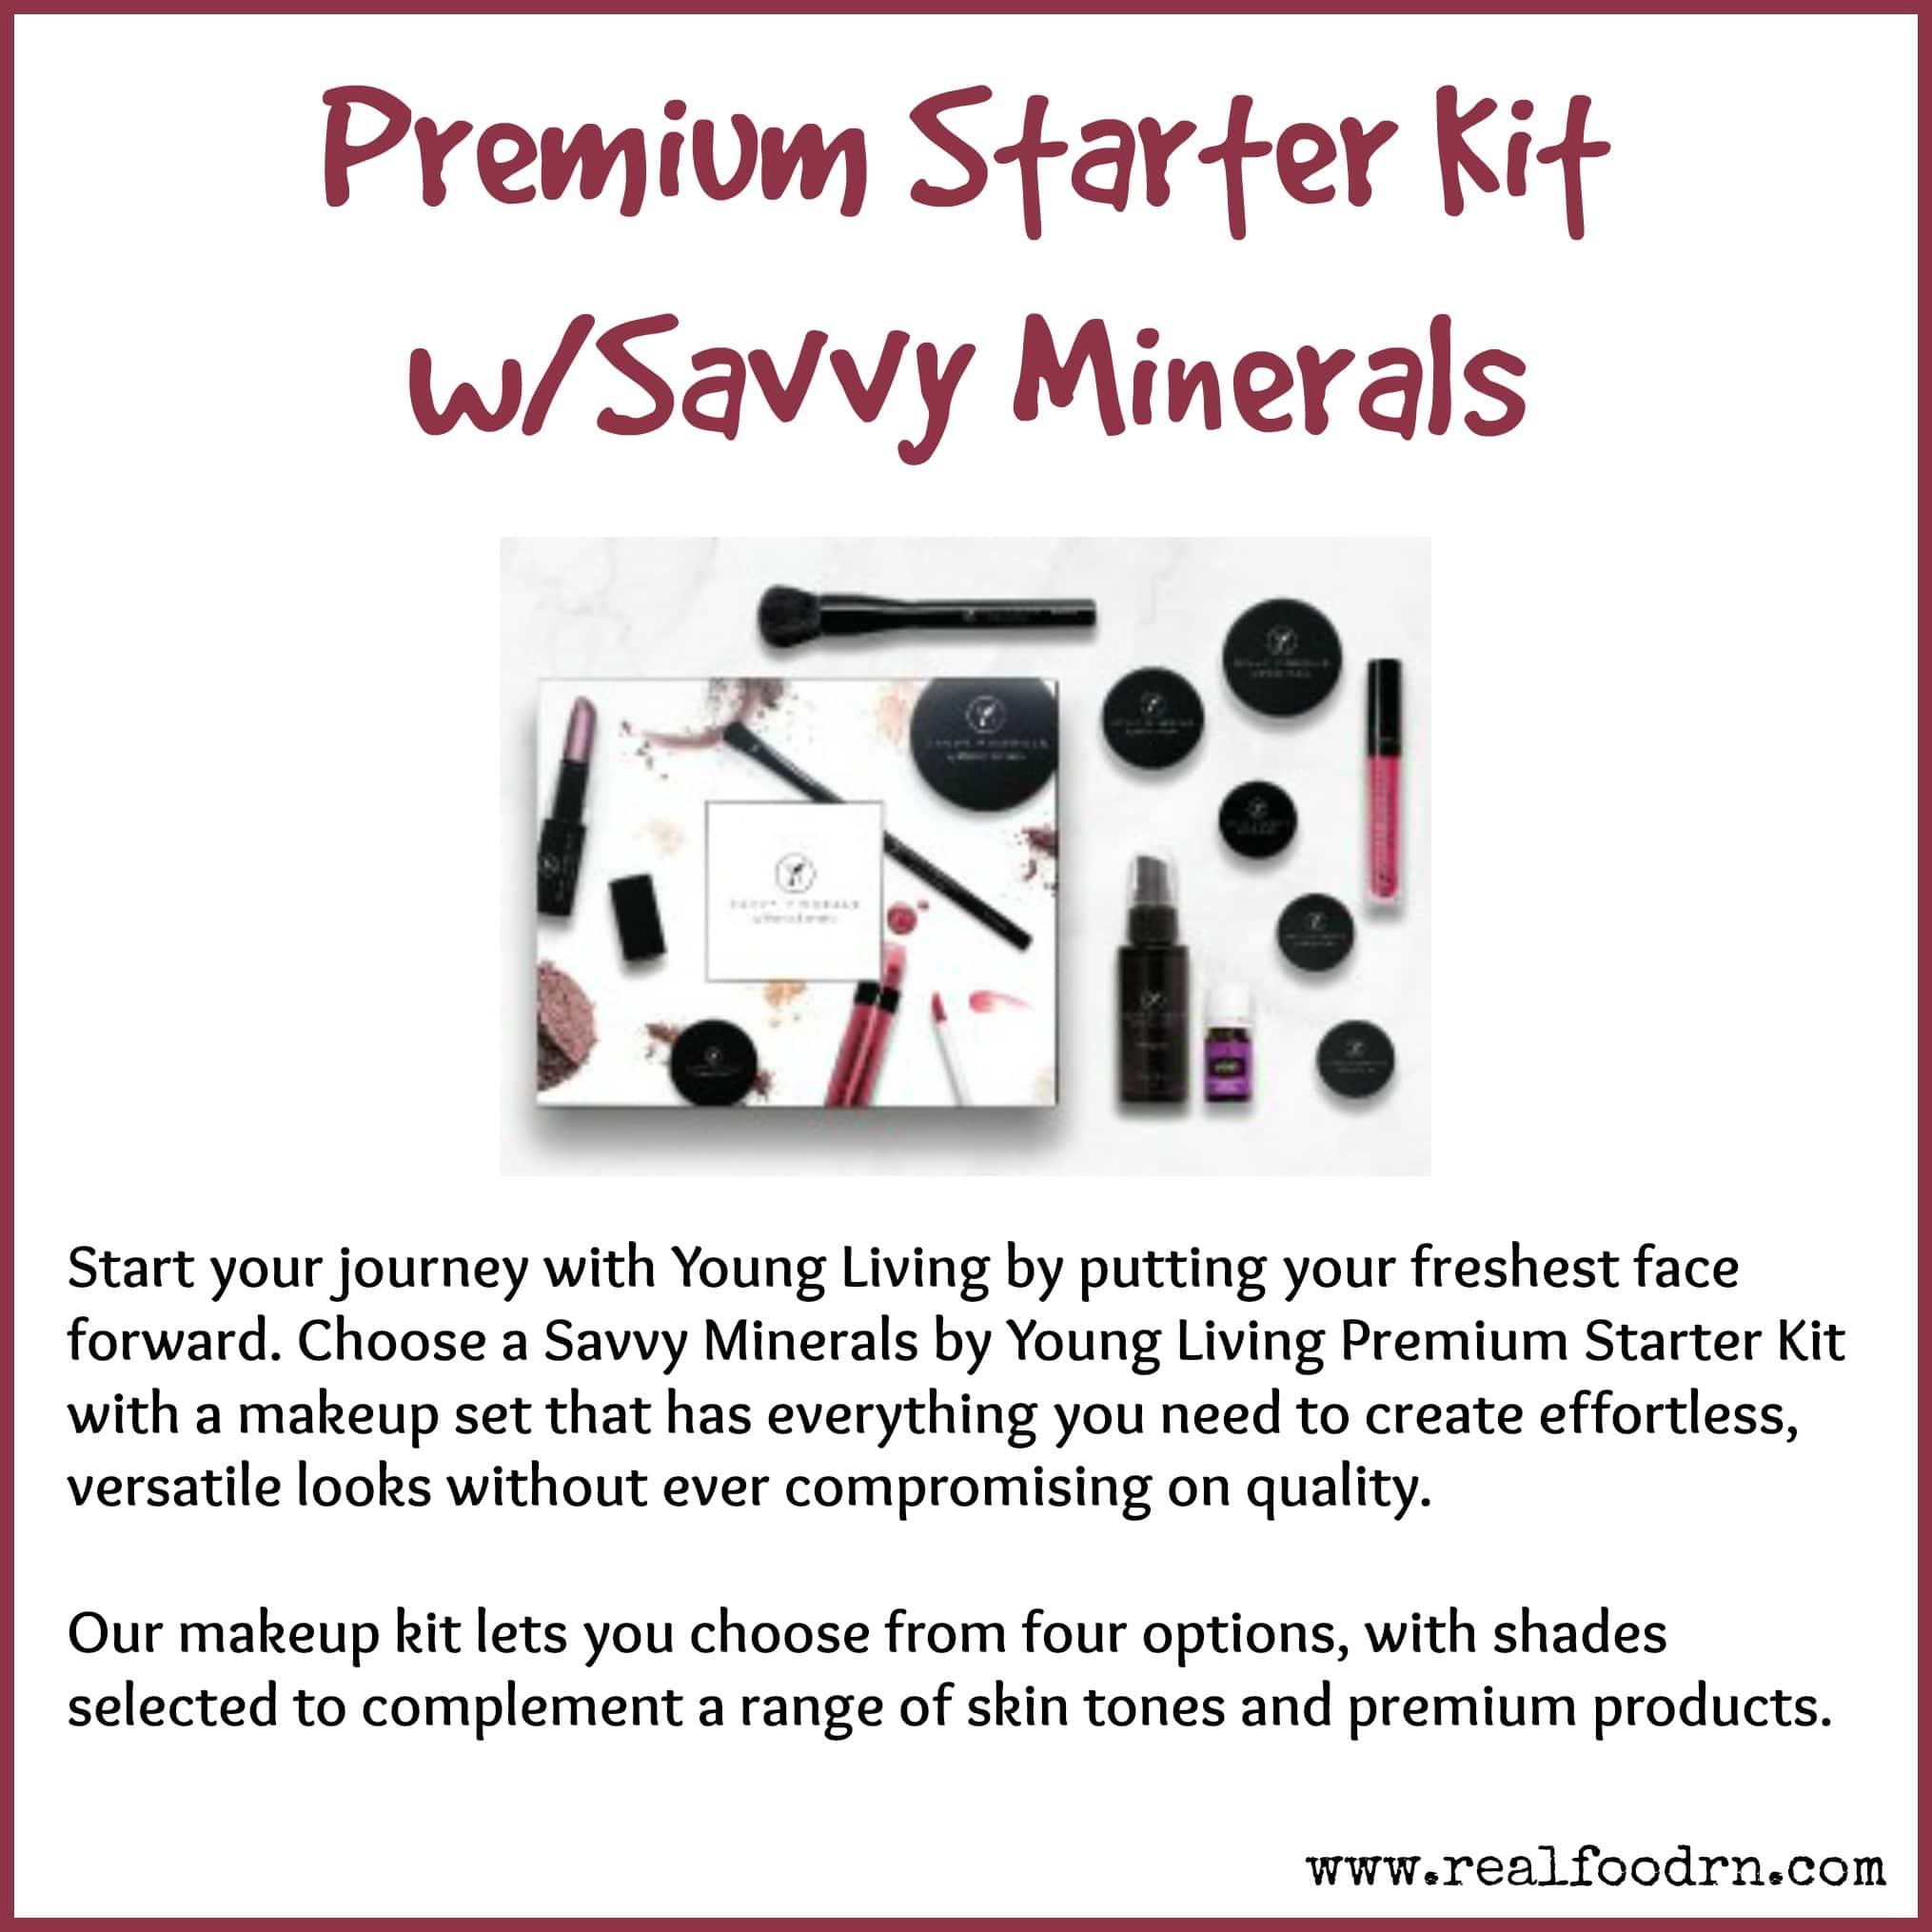 Premium Starter Kit with Savvy Minerals